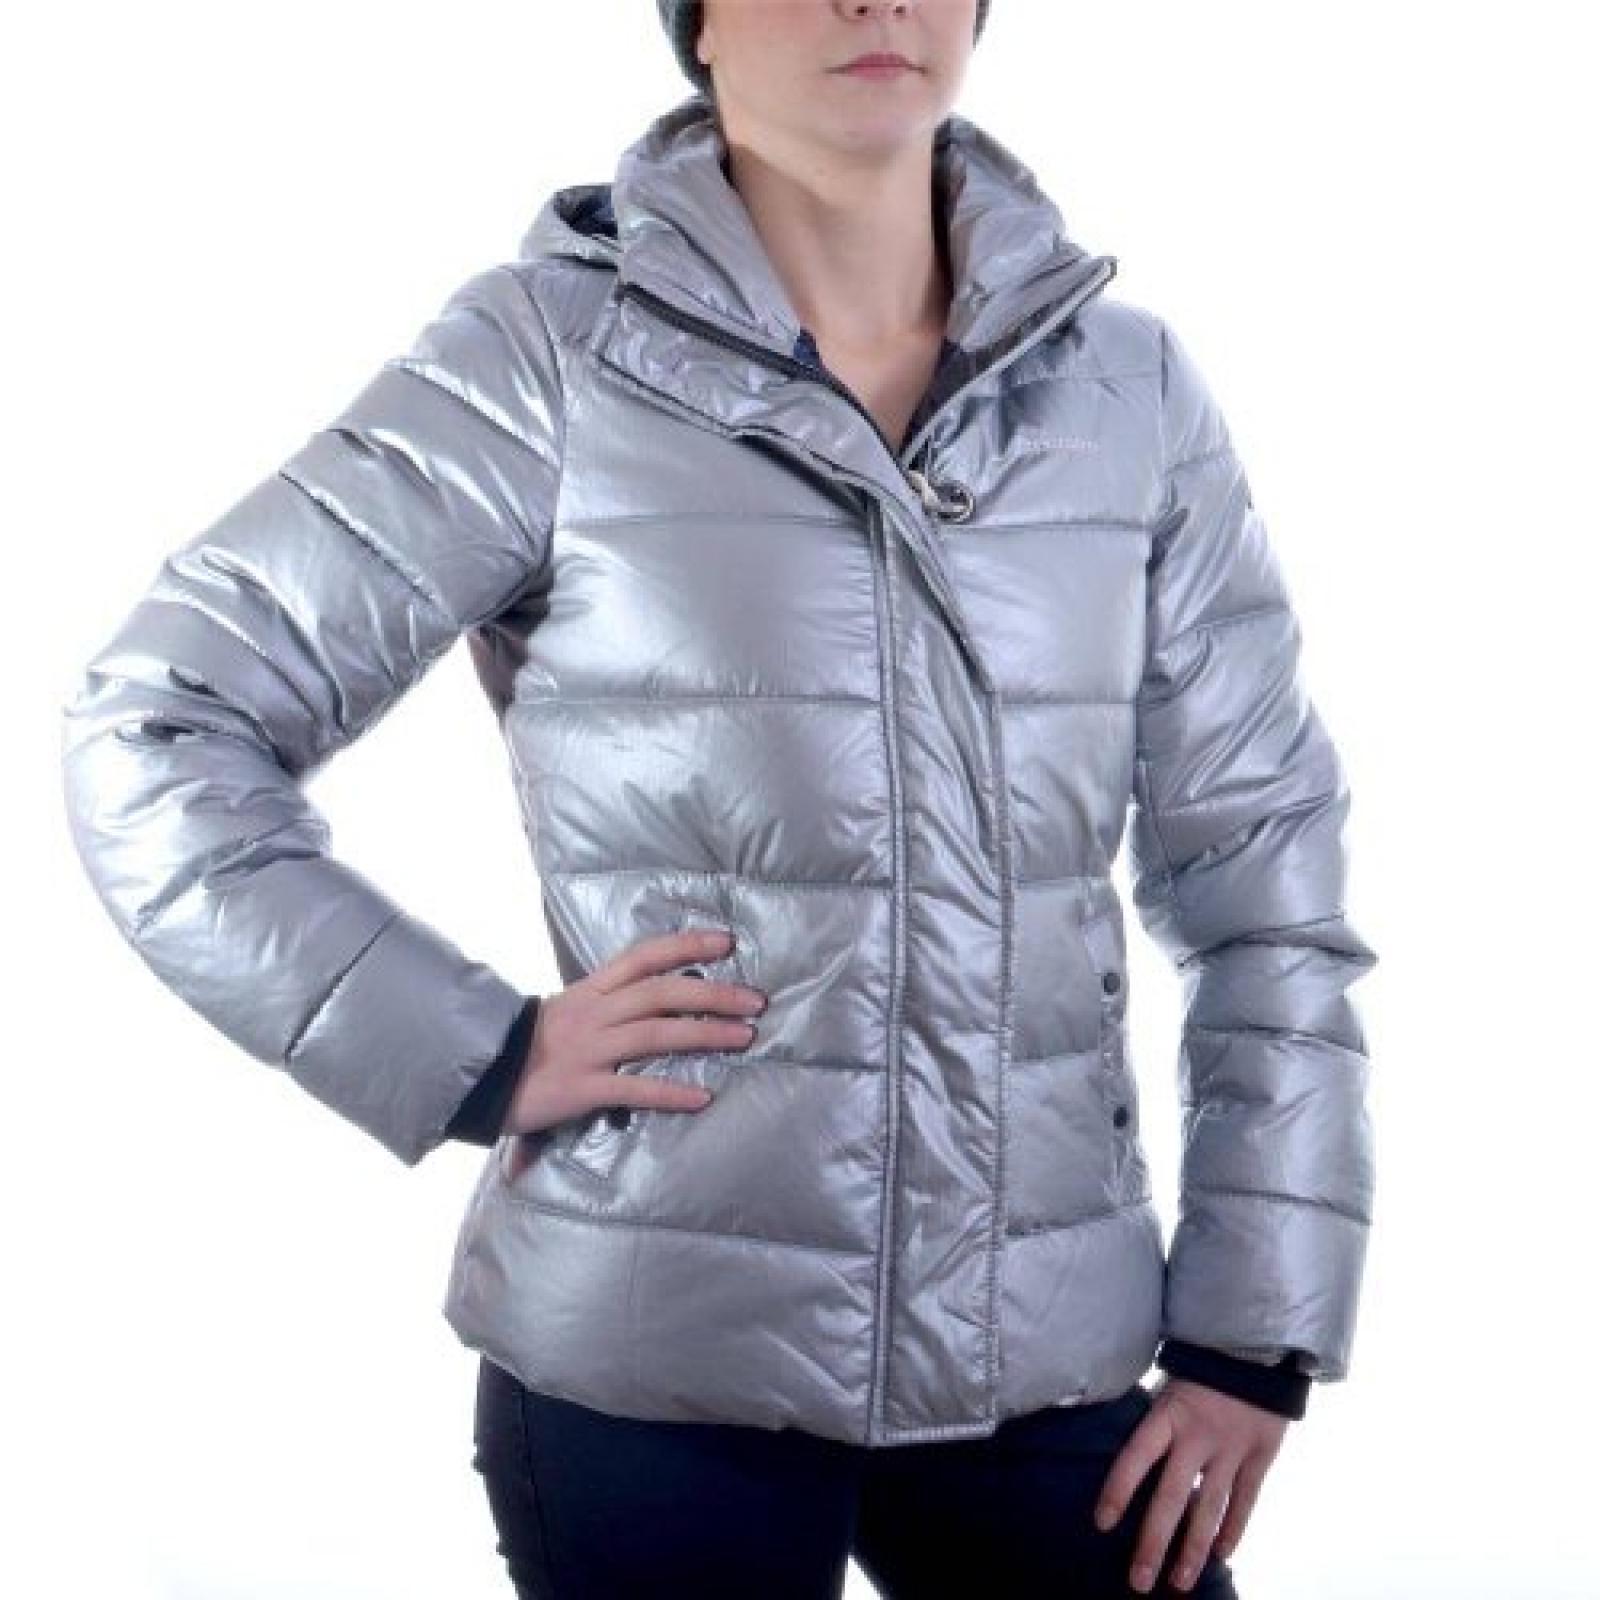 Gaastra Damenjacke Daisies Gr. M UVP 269,95 Euro 36115022 Silber 203 Jacke